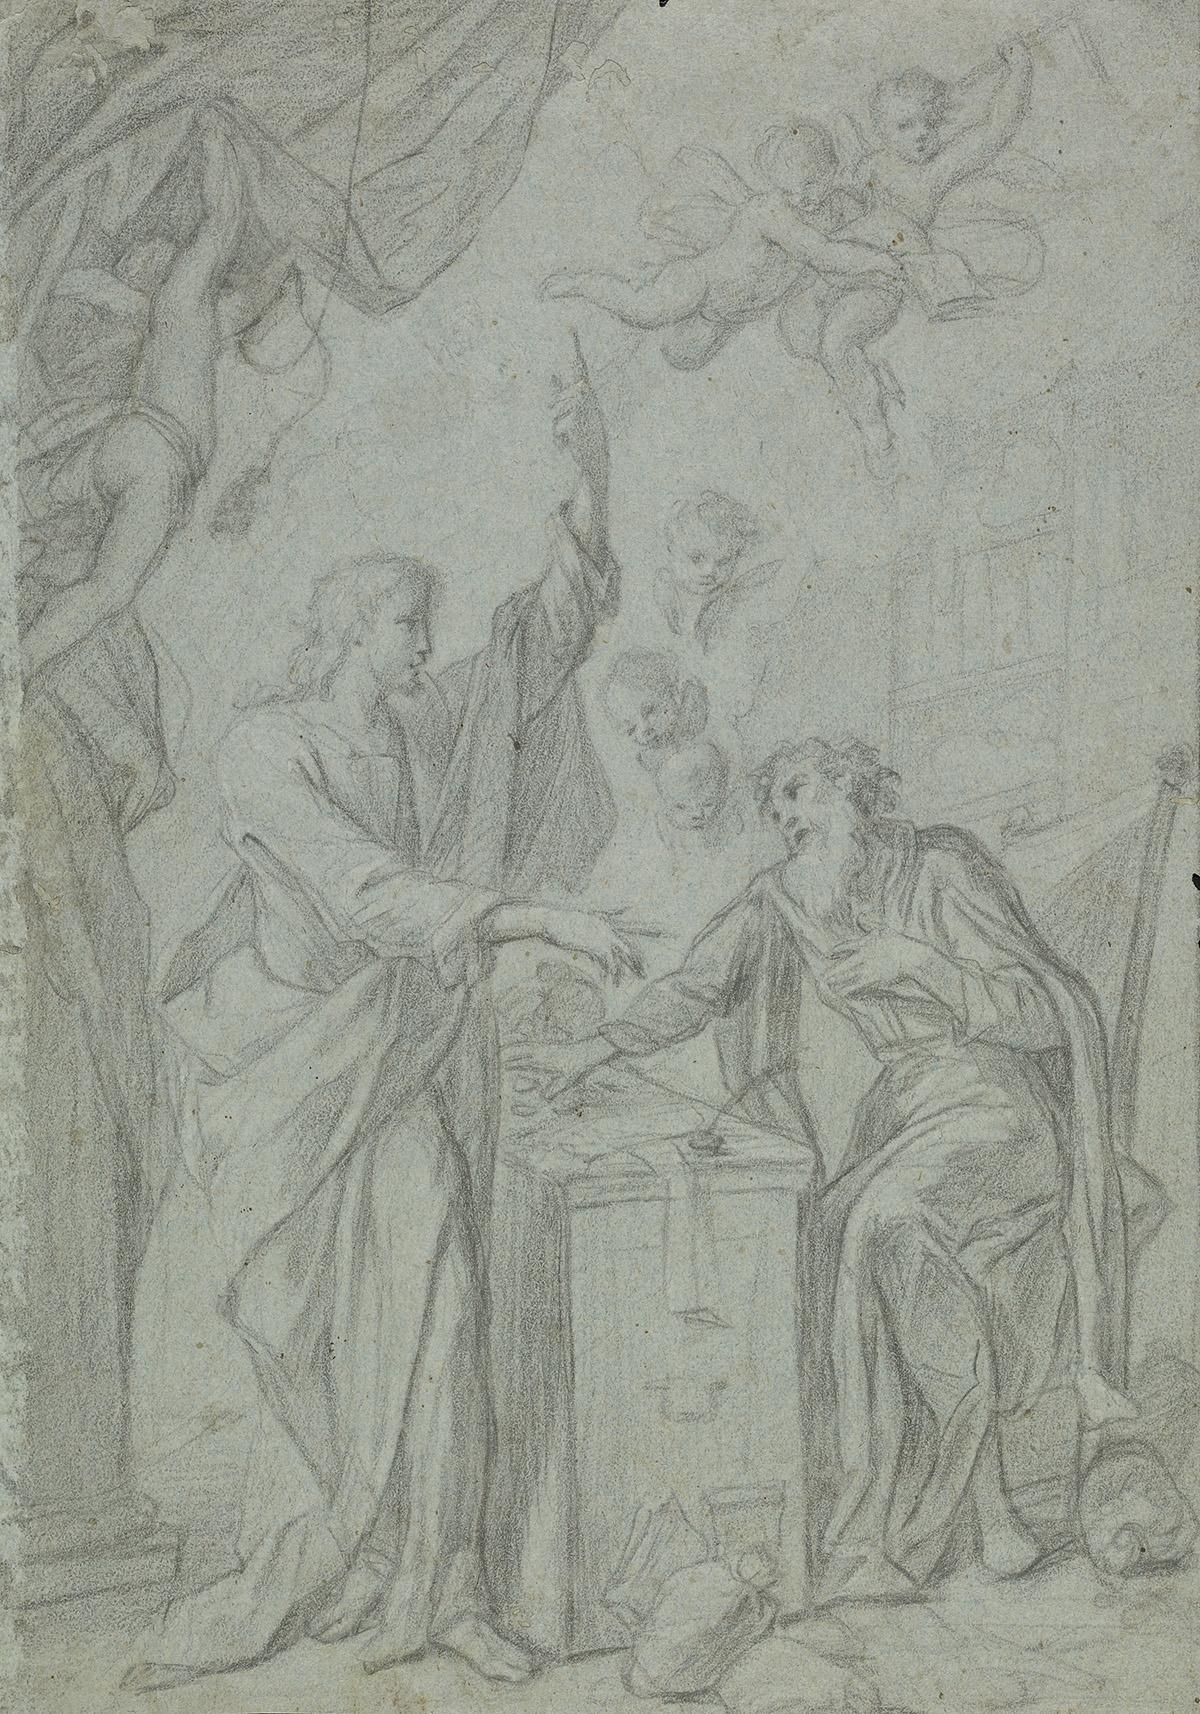 NEAPOLITAN-SCHOOL-17TH-CENTURY-The-Calling-of-St-Matthew